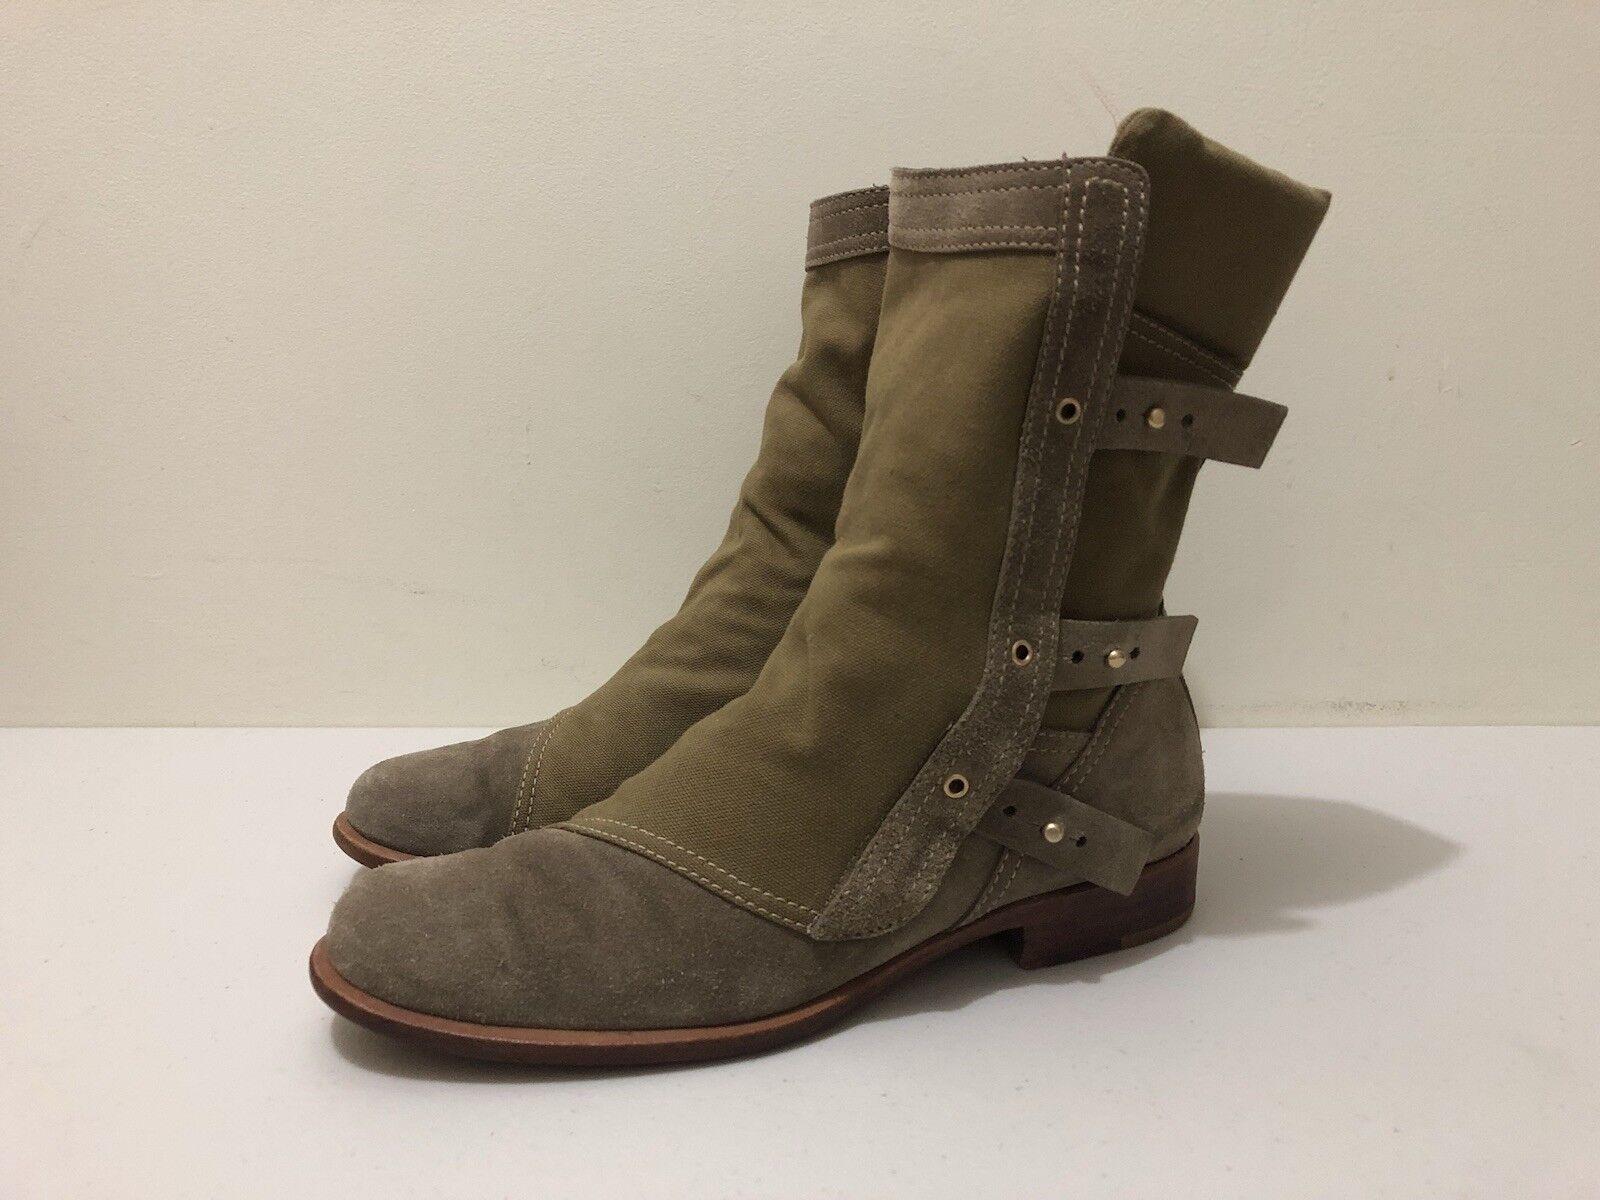 Guiseppe Guiseppe Guiseppe Zanotti para Thakoon botas para mujer estilo militar de  41  de Cuero de Lona  promociones de equipo